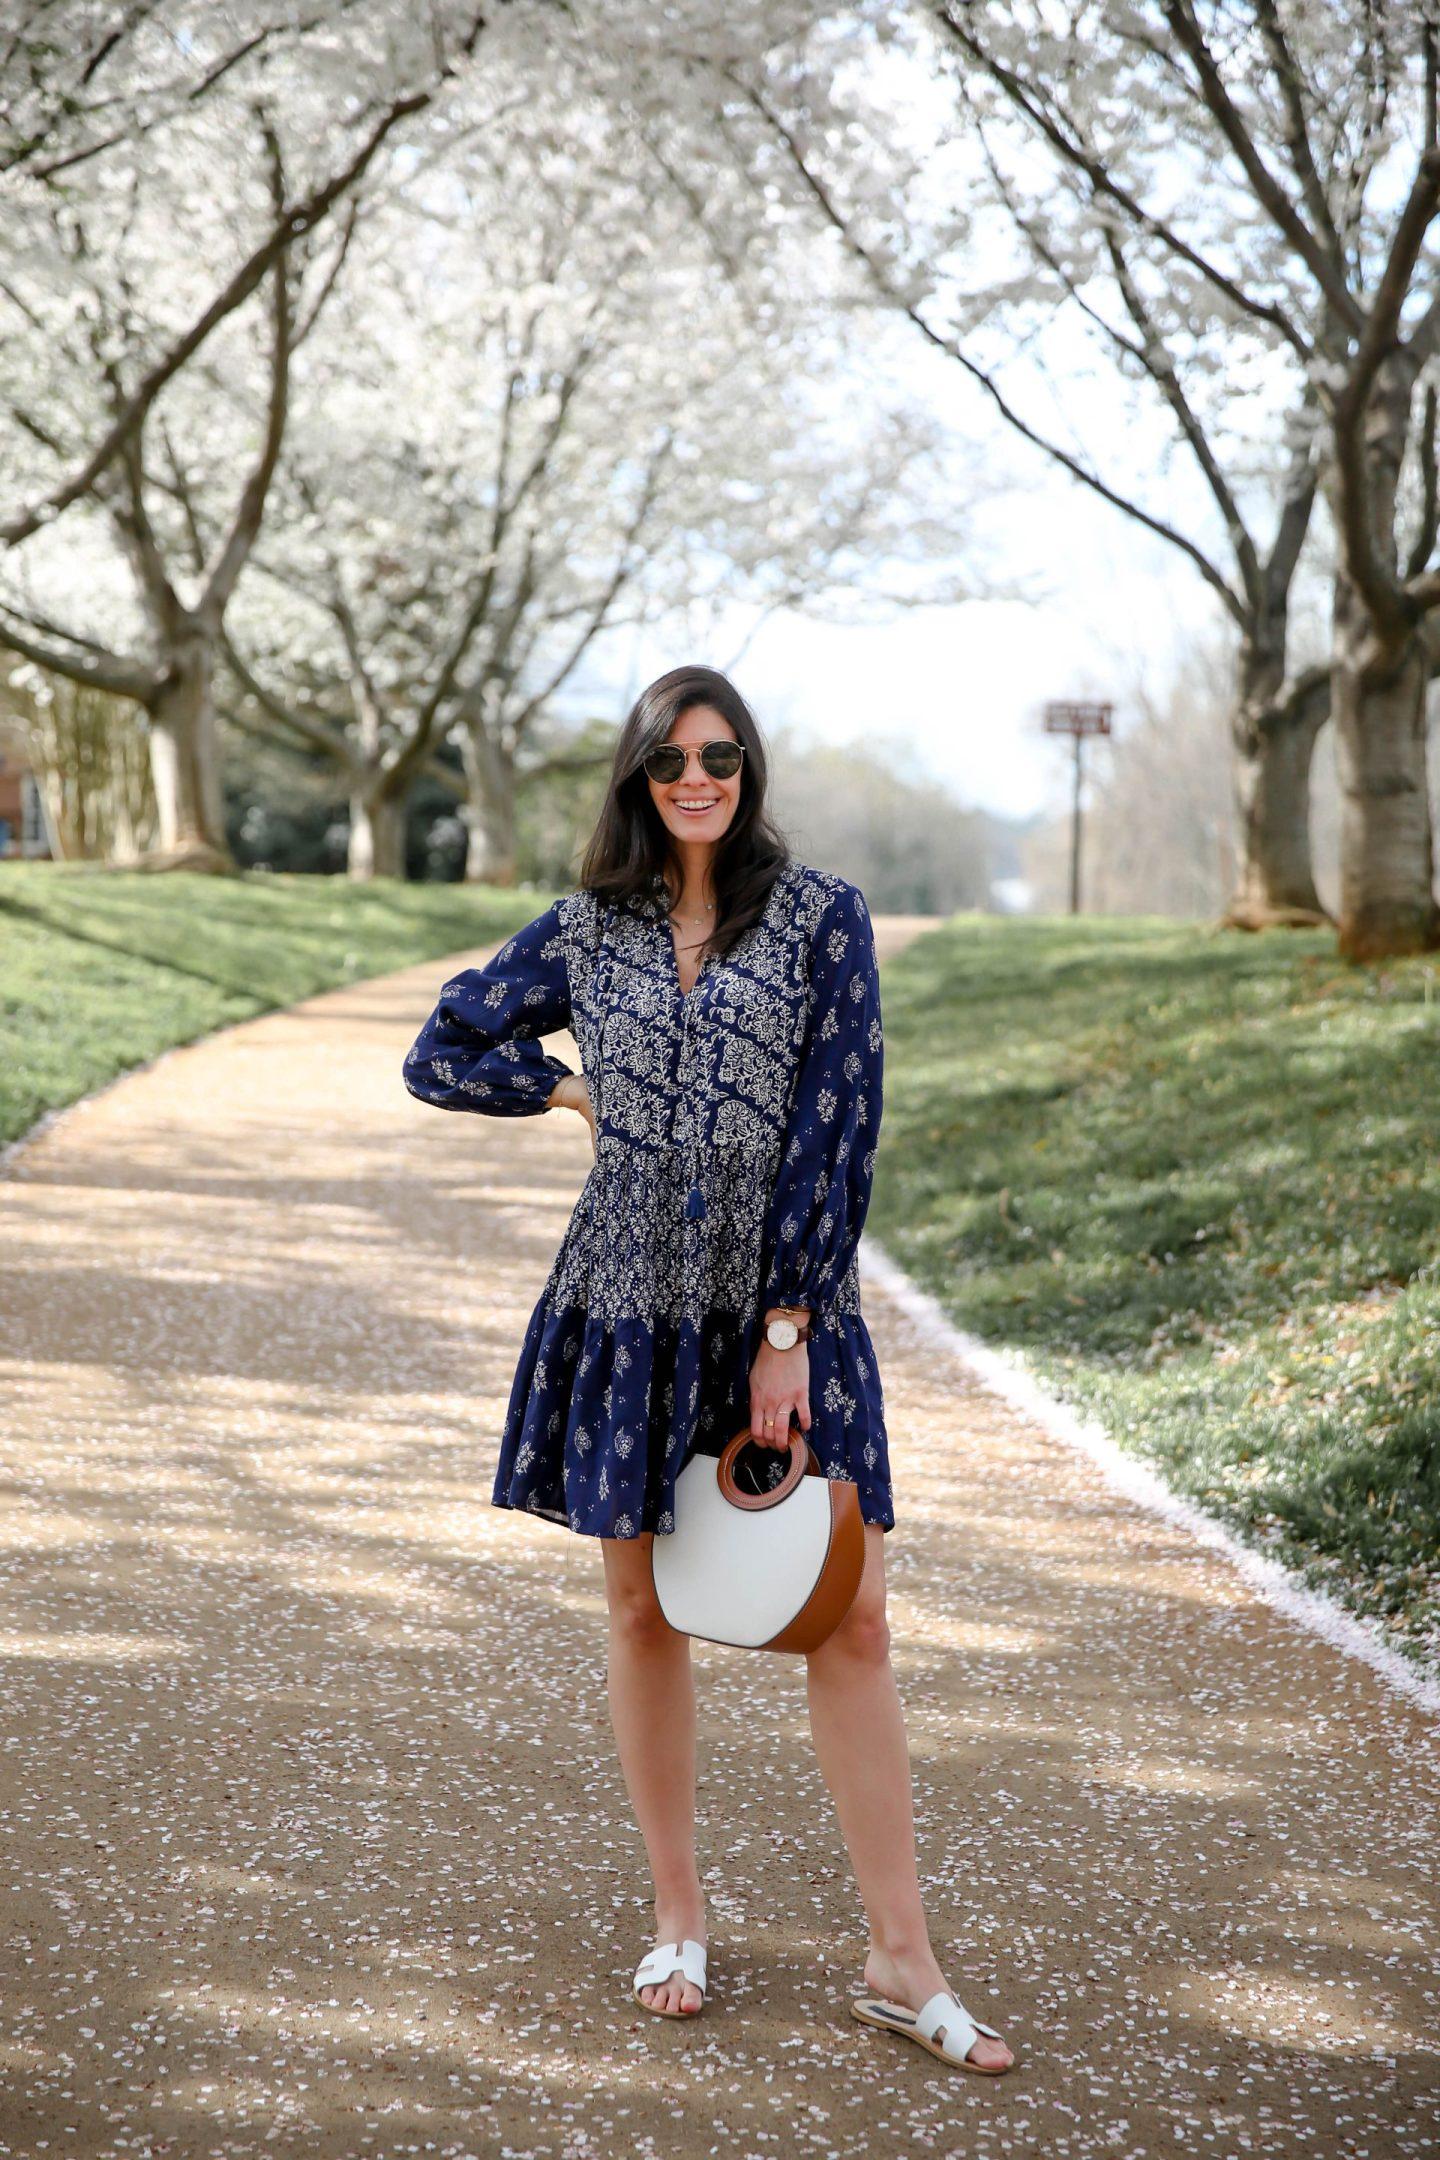 anthropologie - swing dress - spring style - Lauren Schwaiger